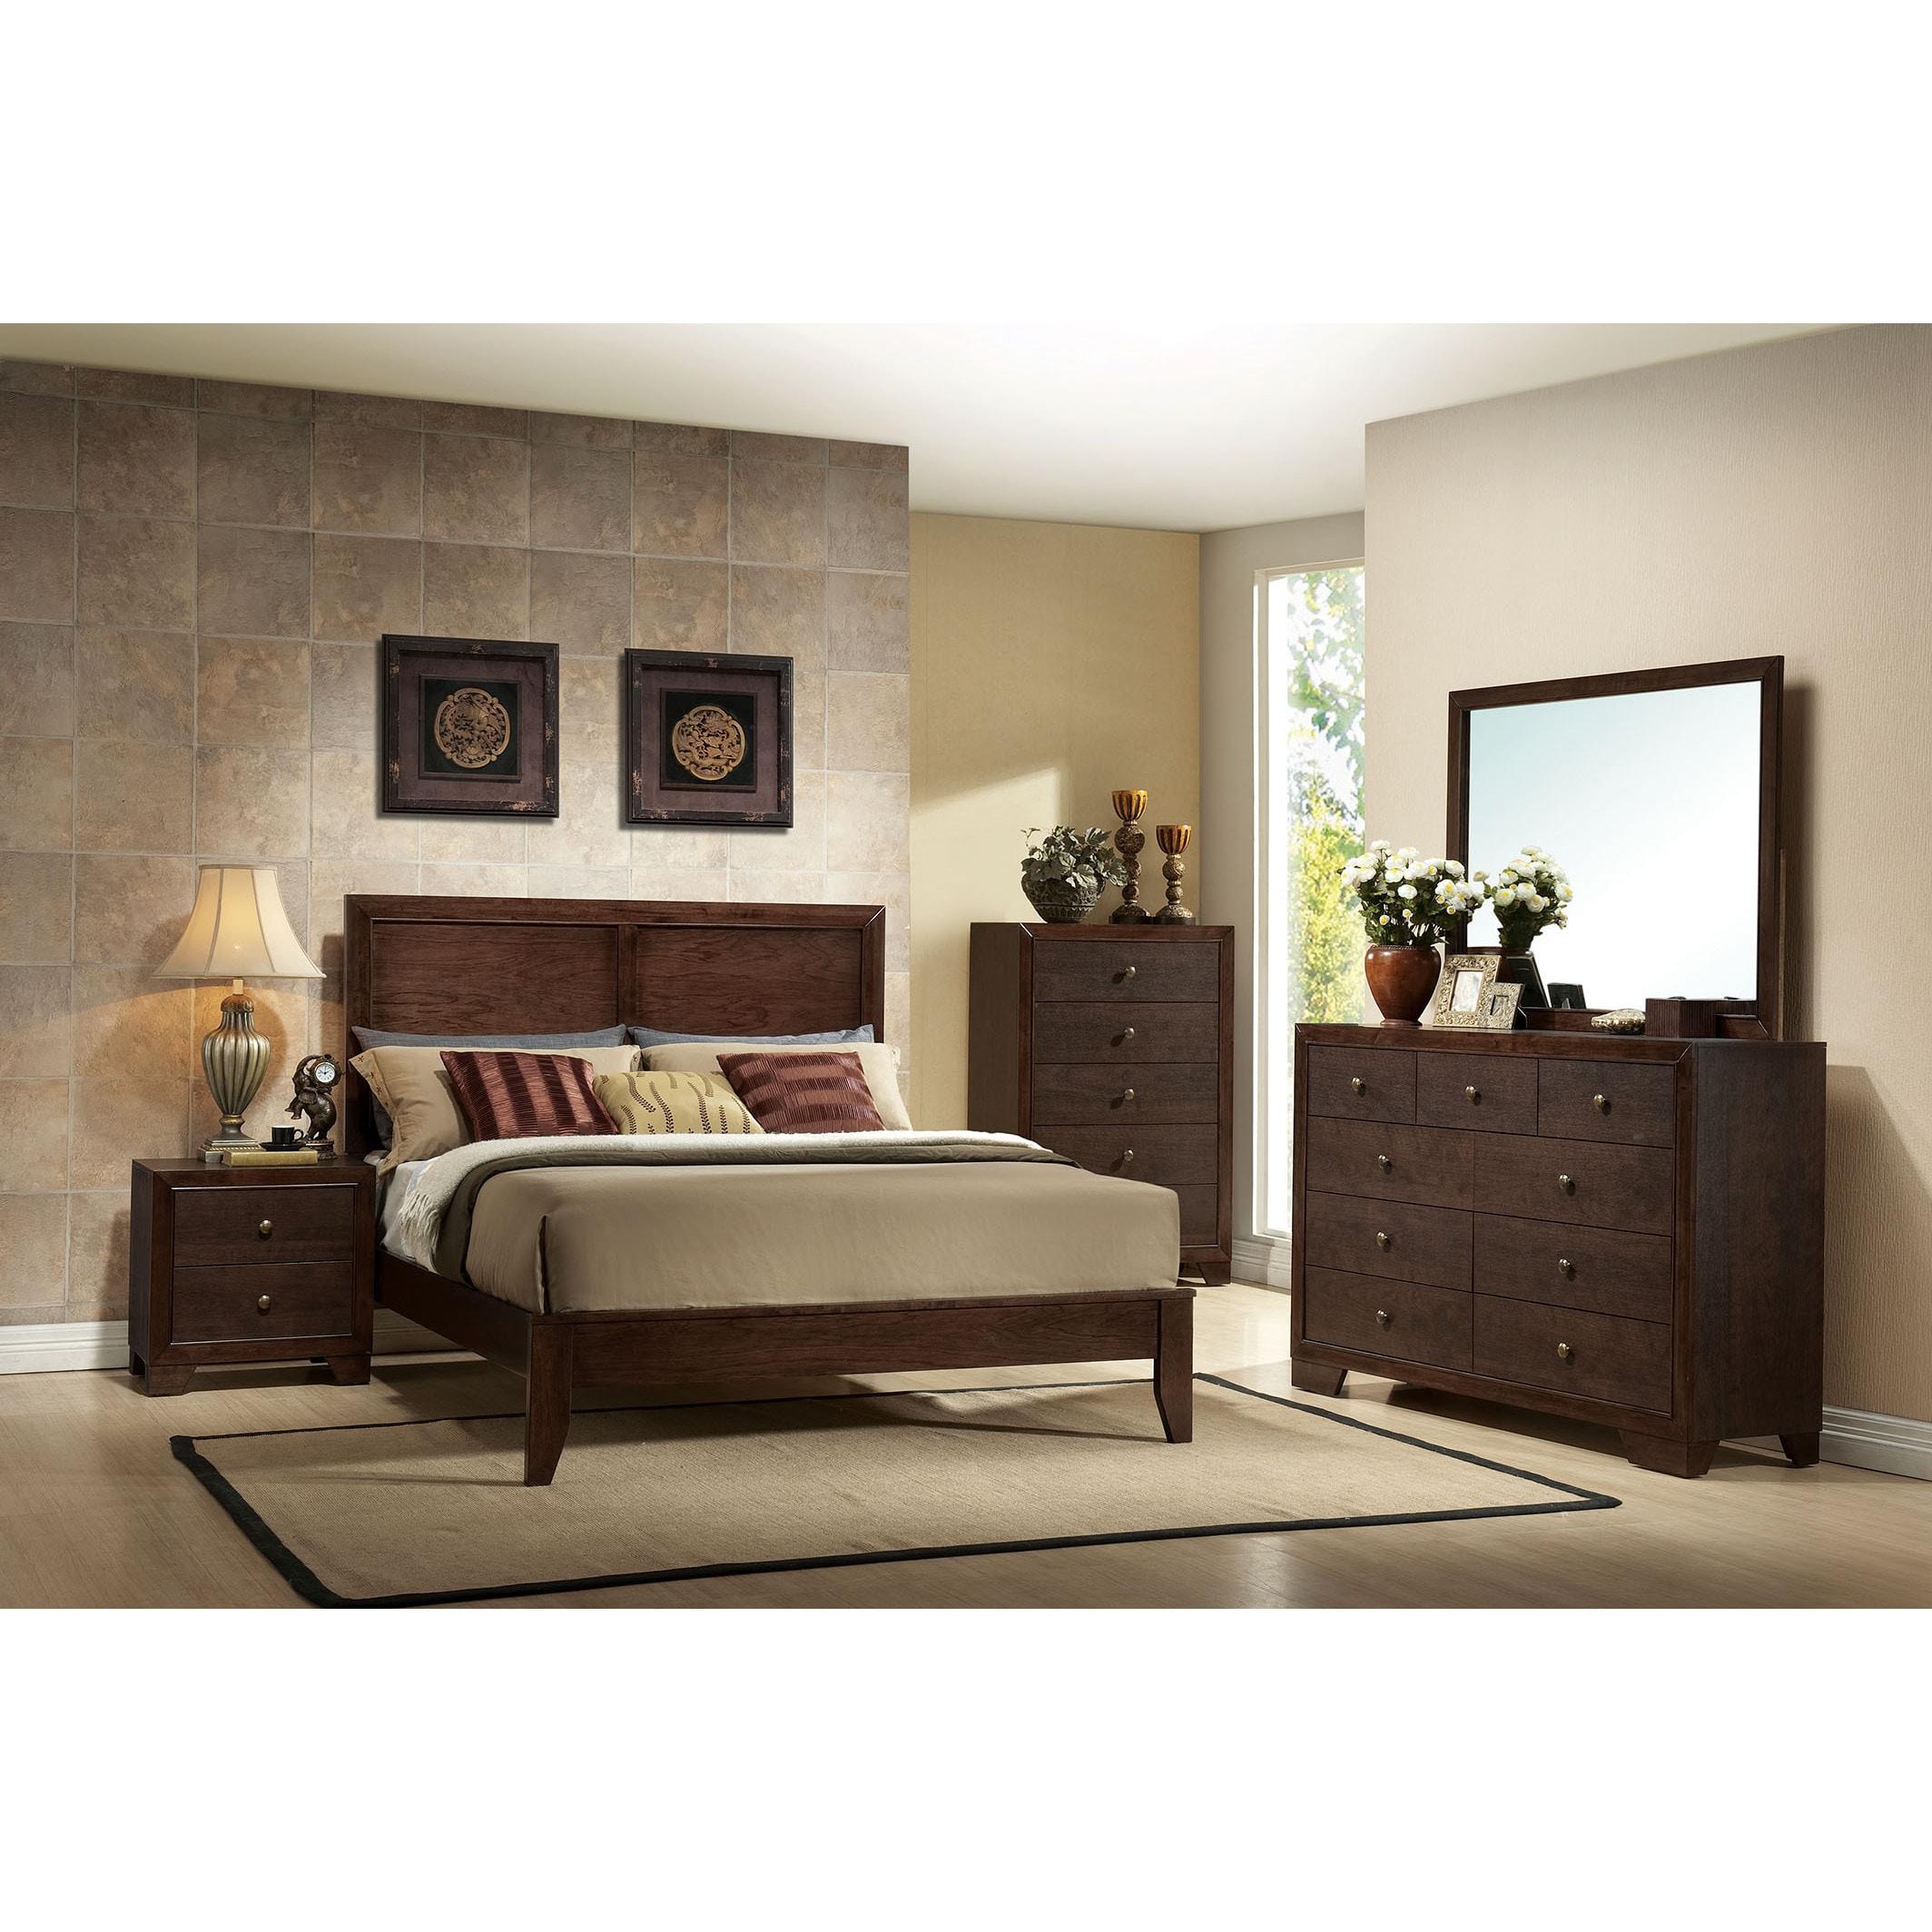 Shop madison espresso 4 piece bedroom set free shipping today overstock com 12271680